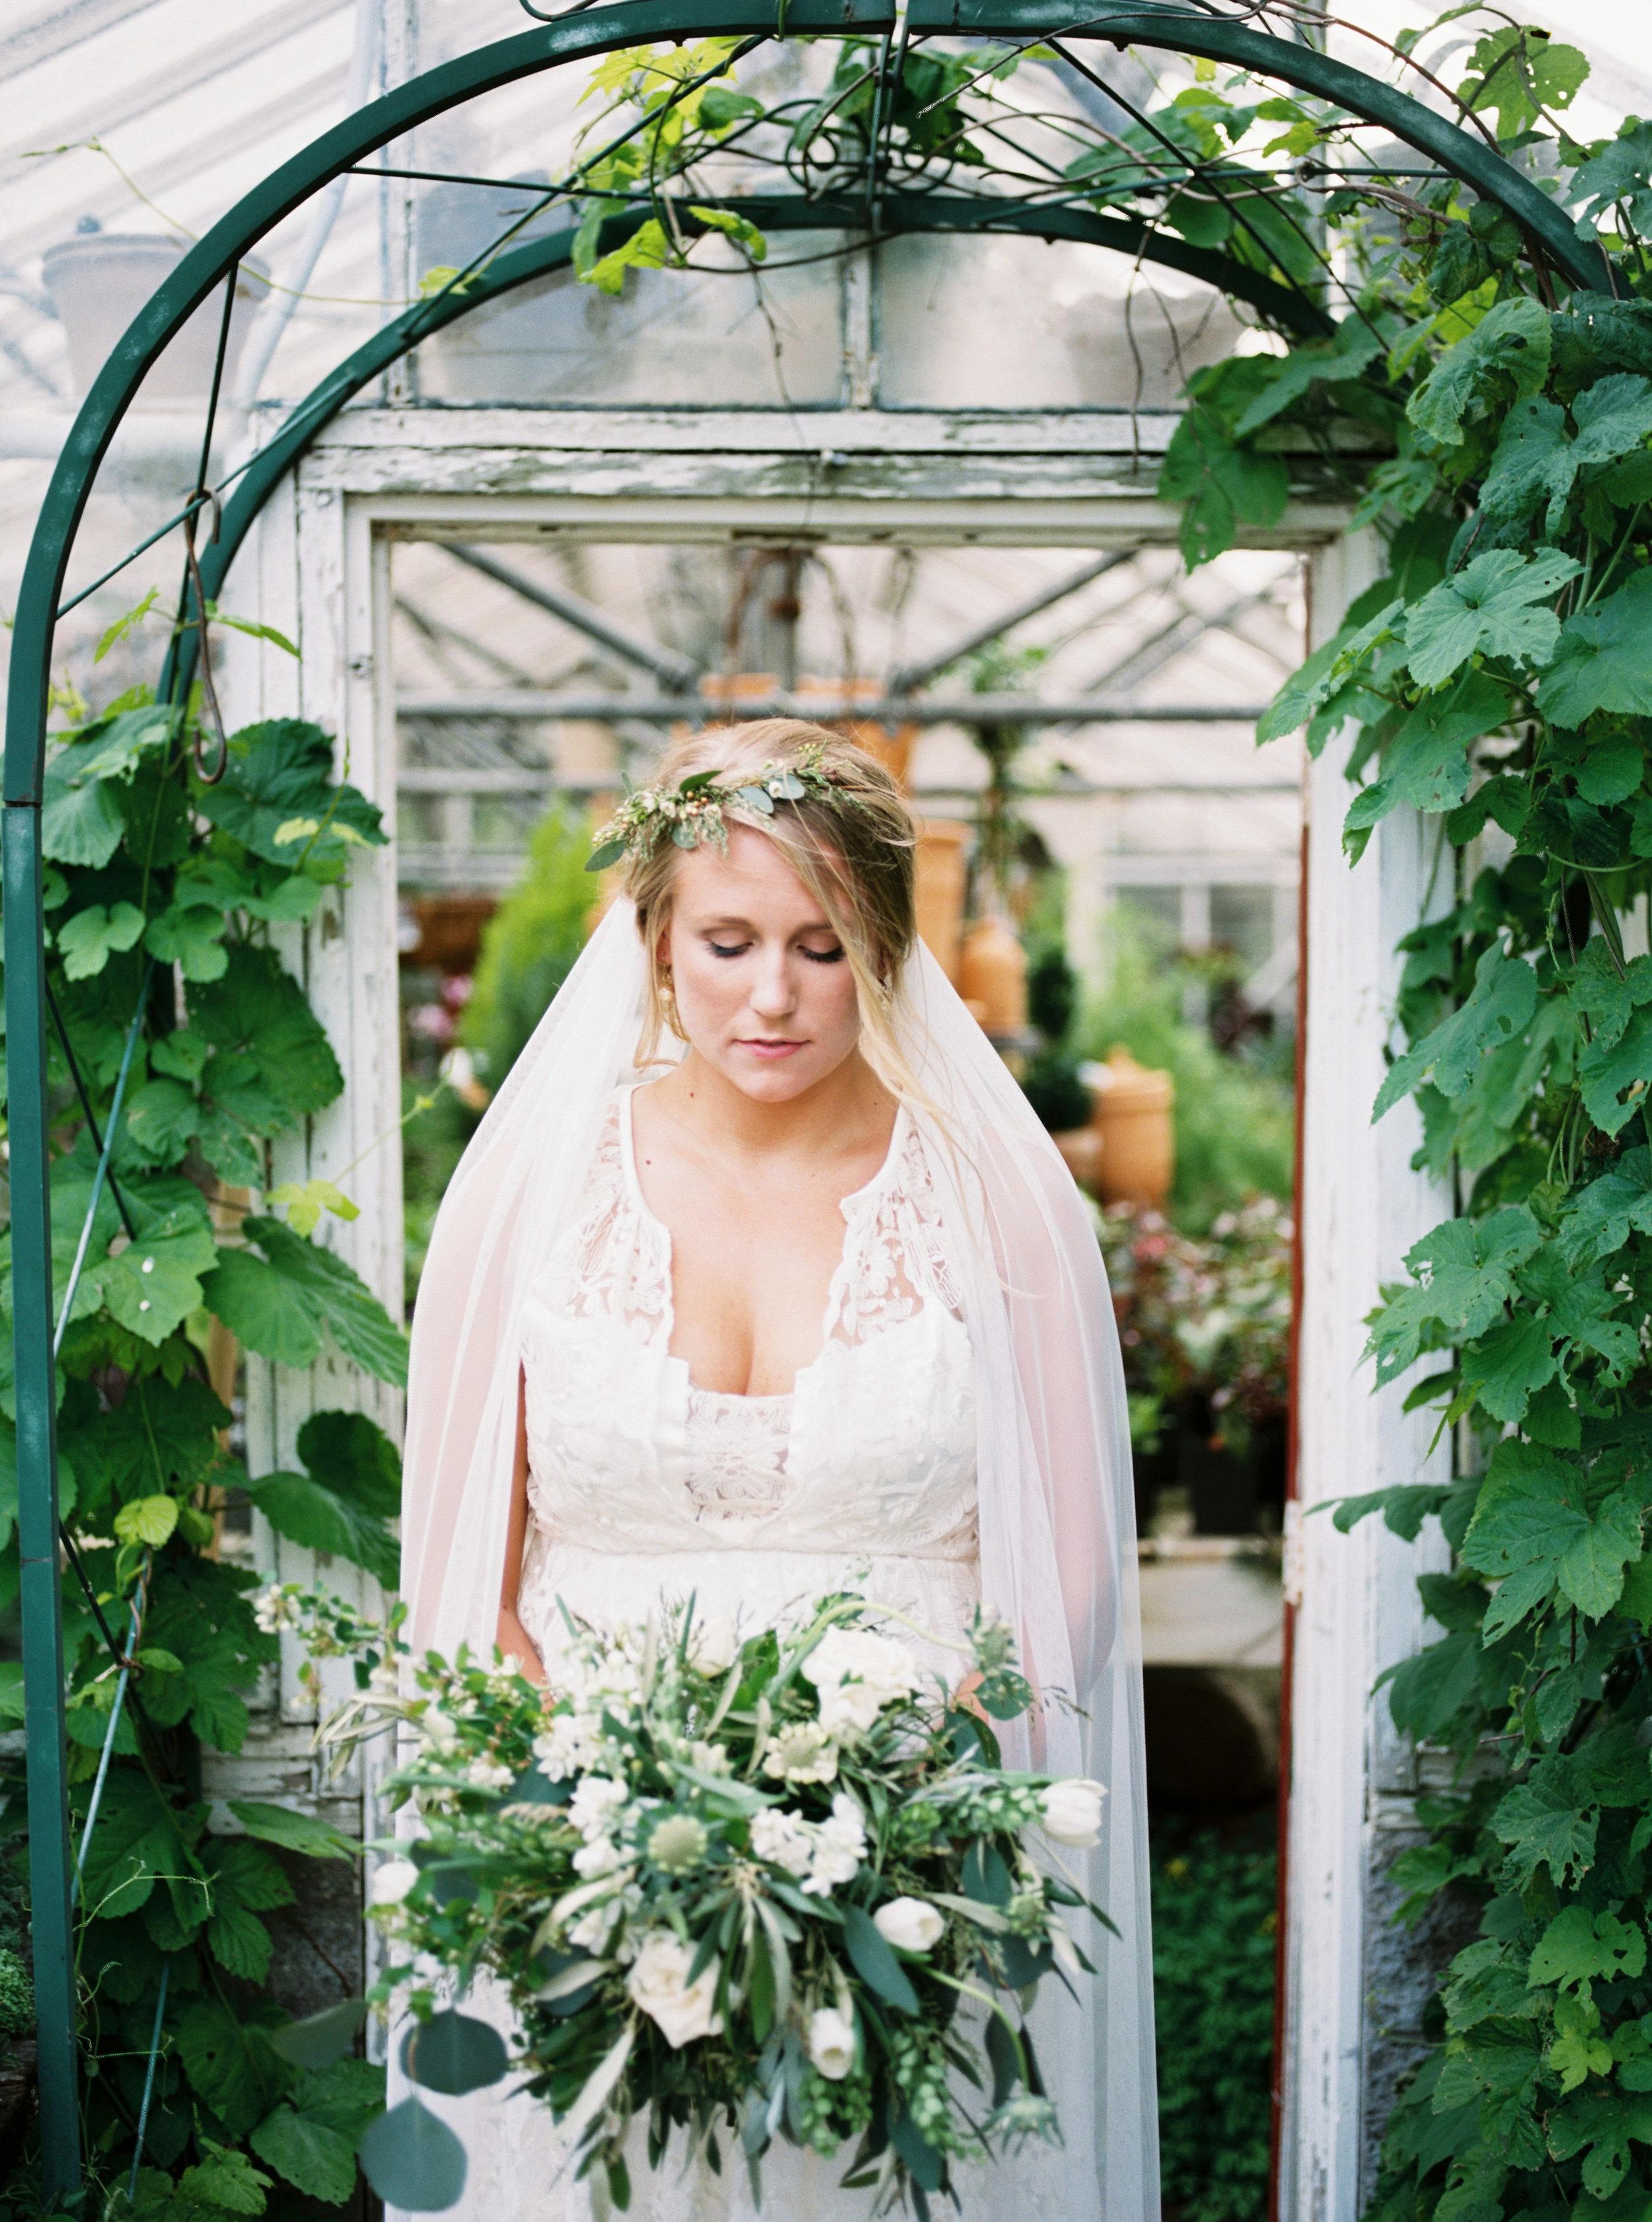 greenhouse-wedding-inspiration-by-laurelyn-savannah-photography-132.jpg